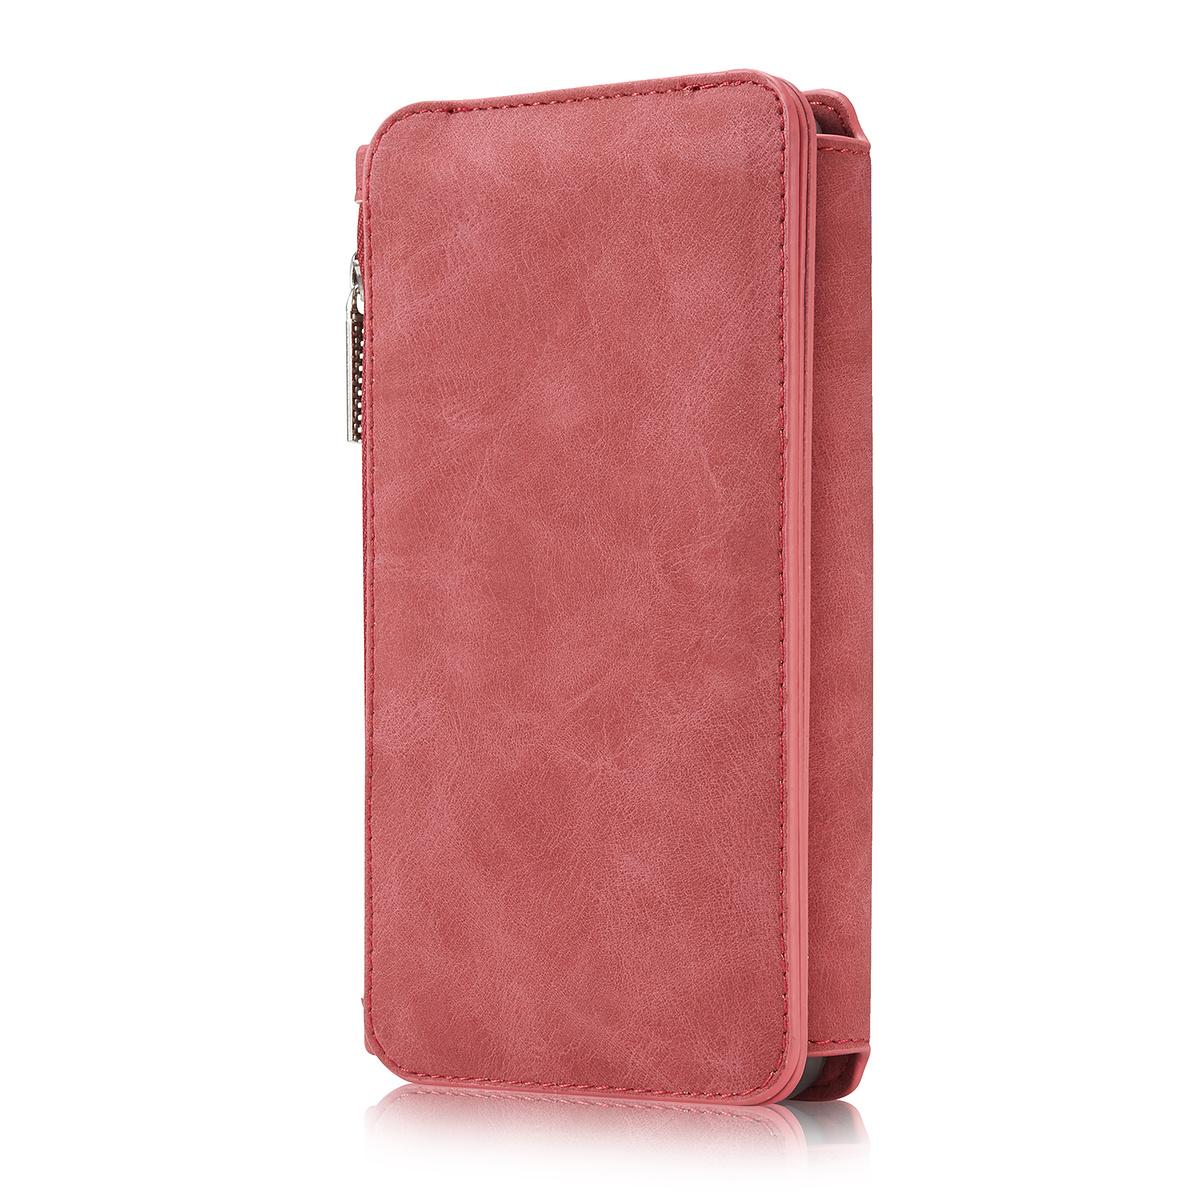 CaseMe plånboksfodral med magnetskal, Samsung Galaxy S8, röd